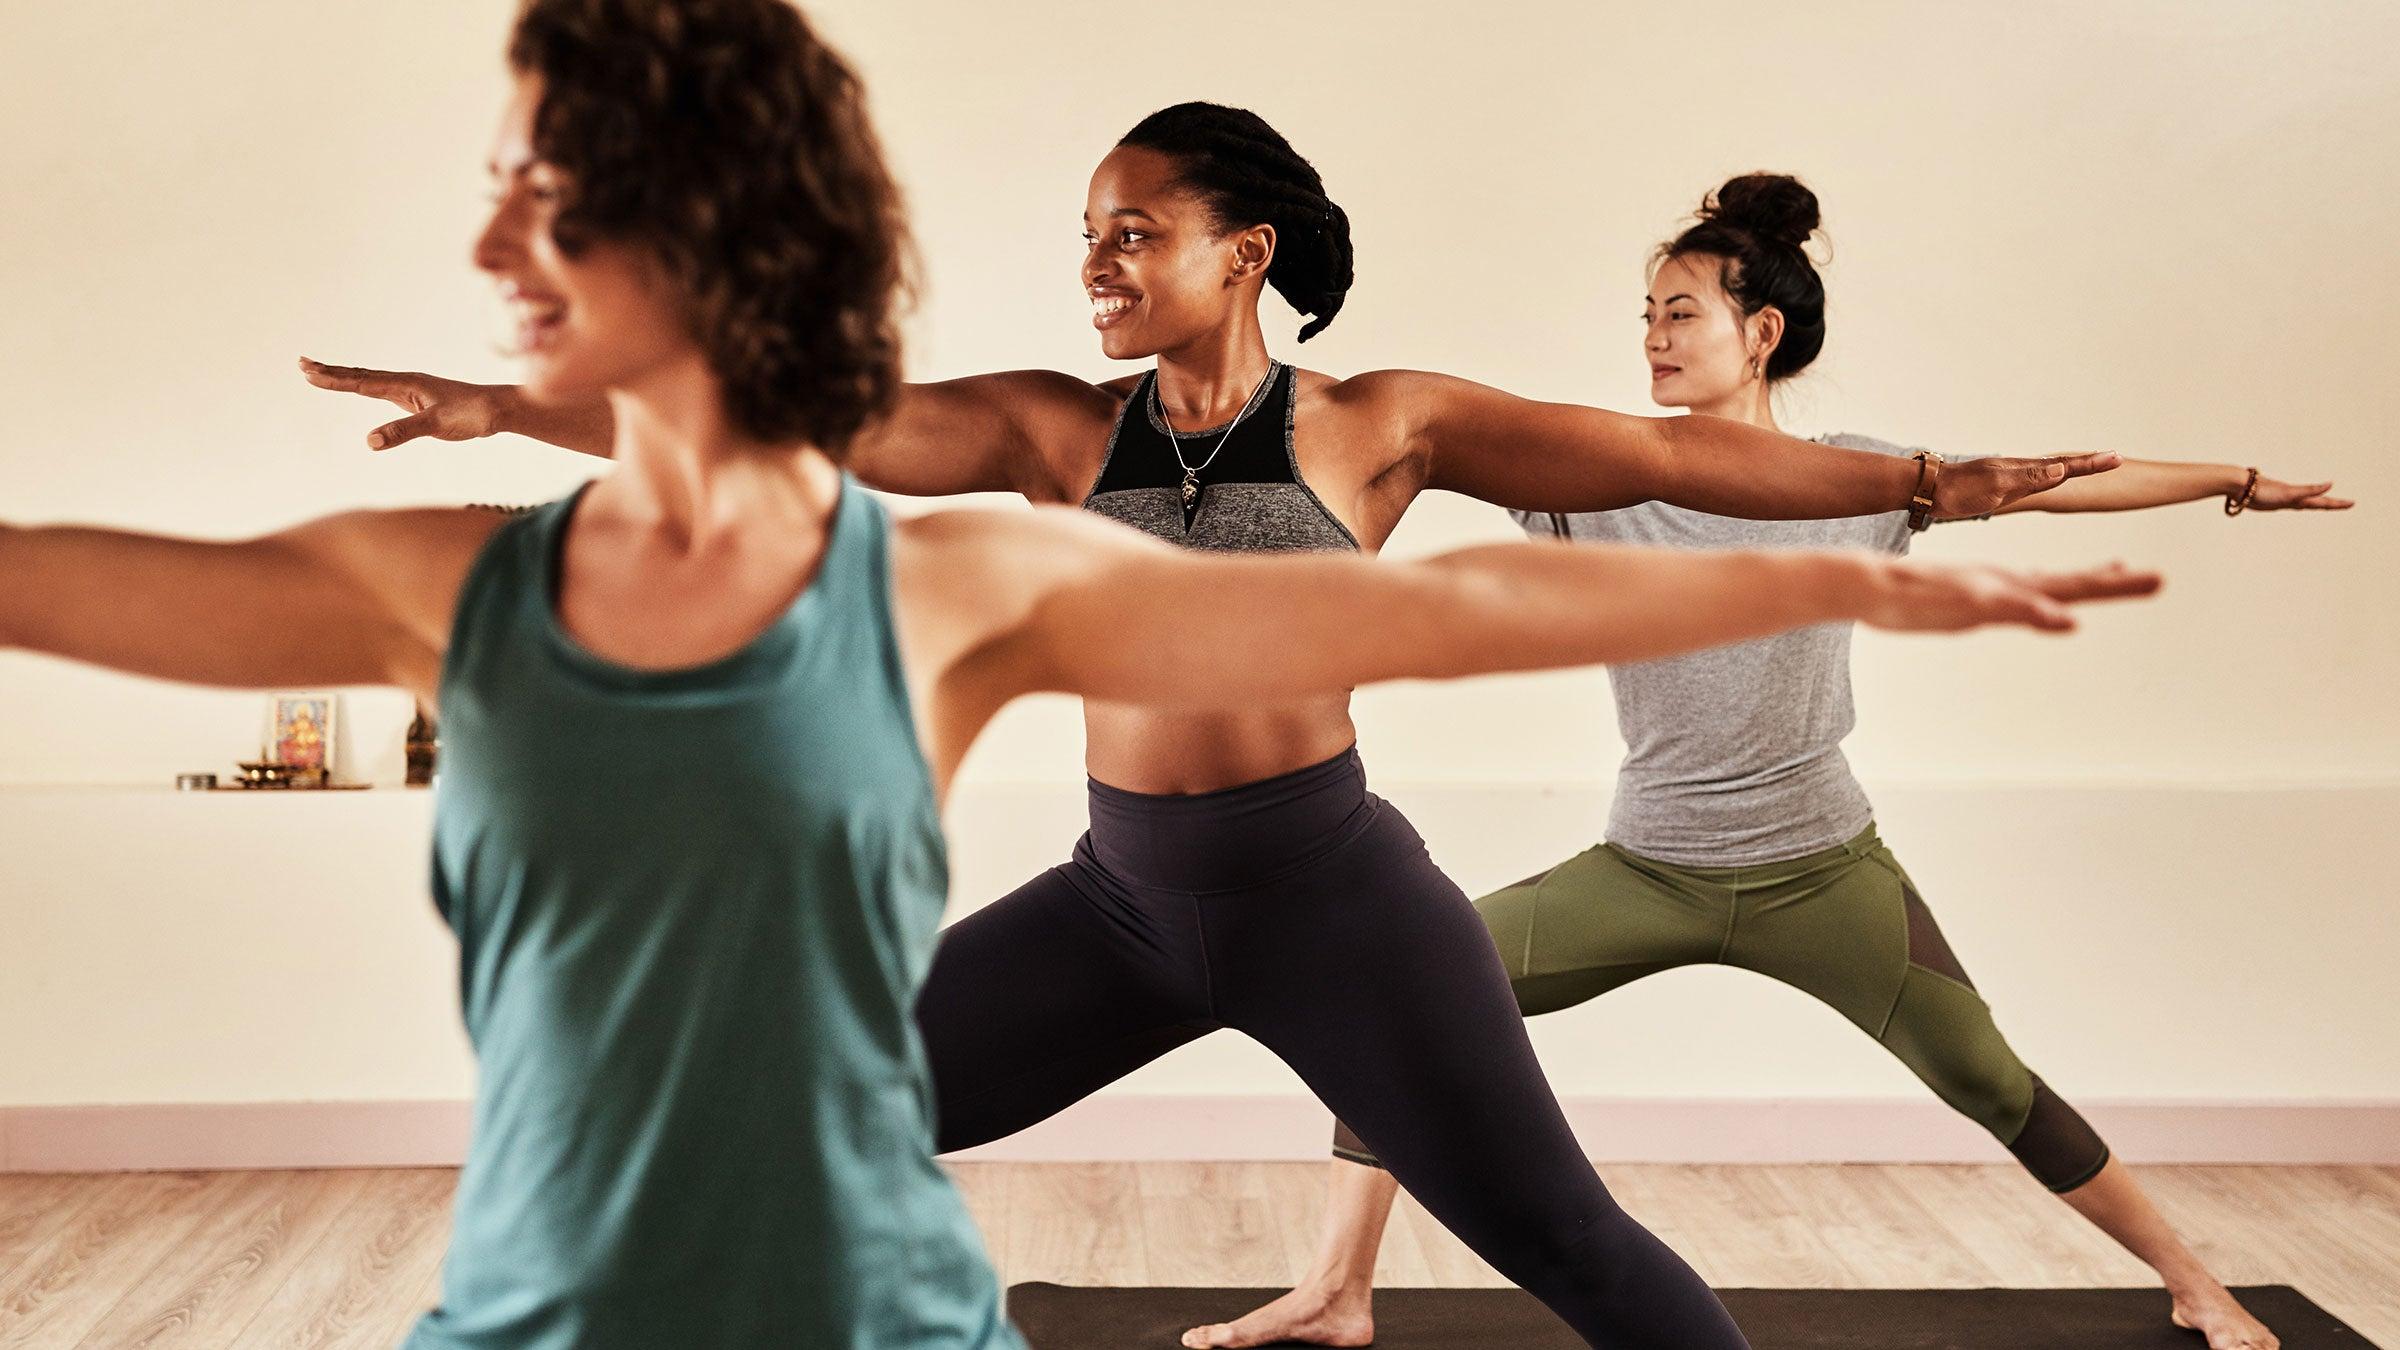 Women demonstrate Warrior II in yoga class